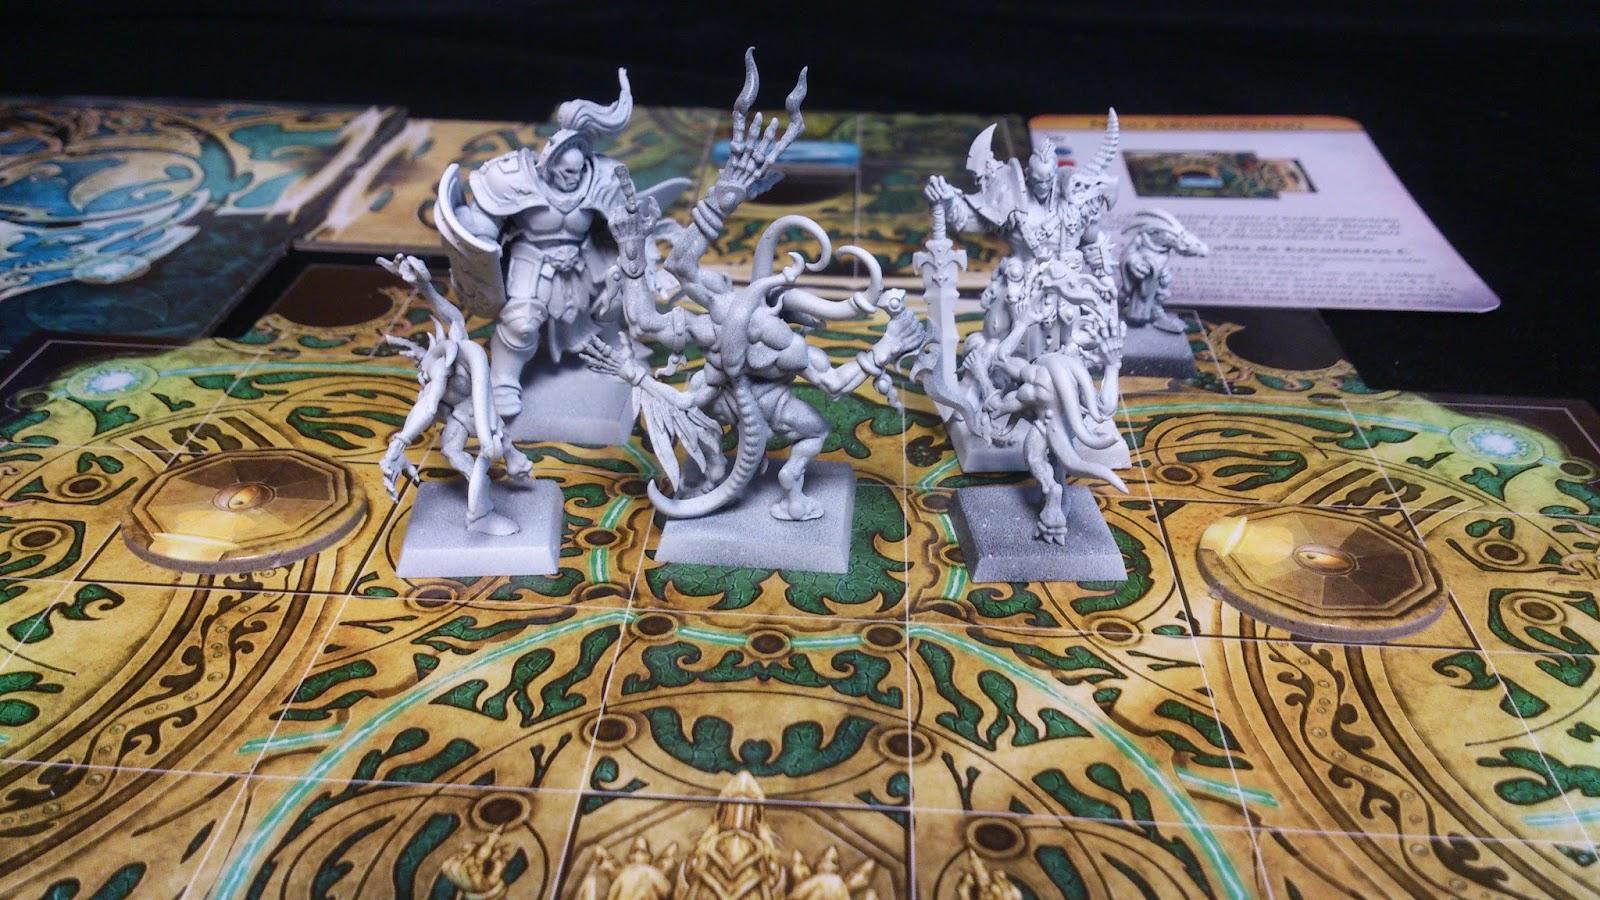 La Buhardilla Del Friki Warhammer Quest Silver Tower Resena